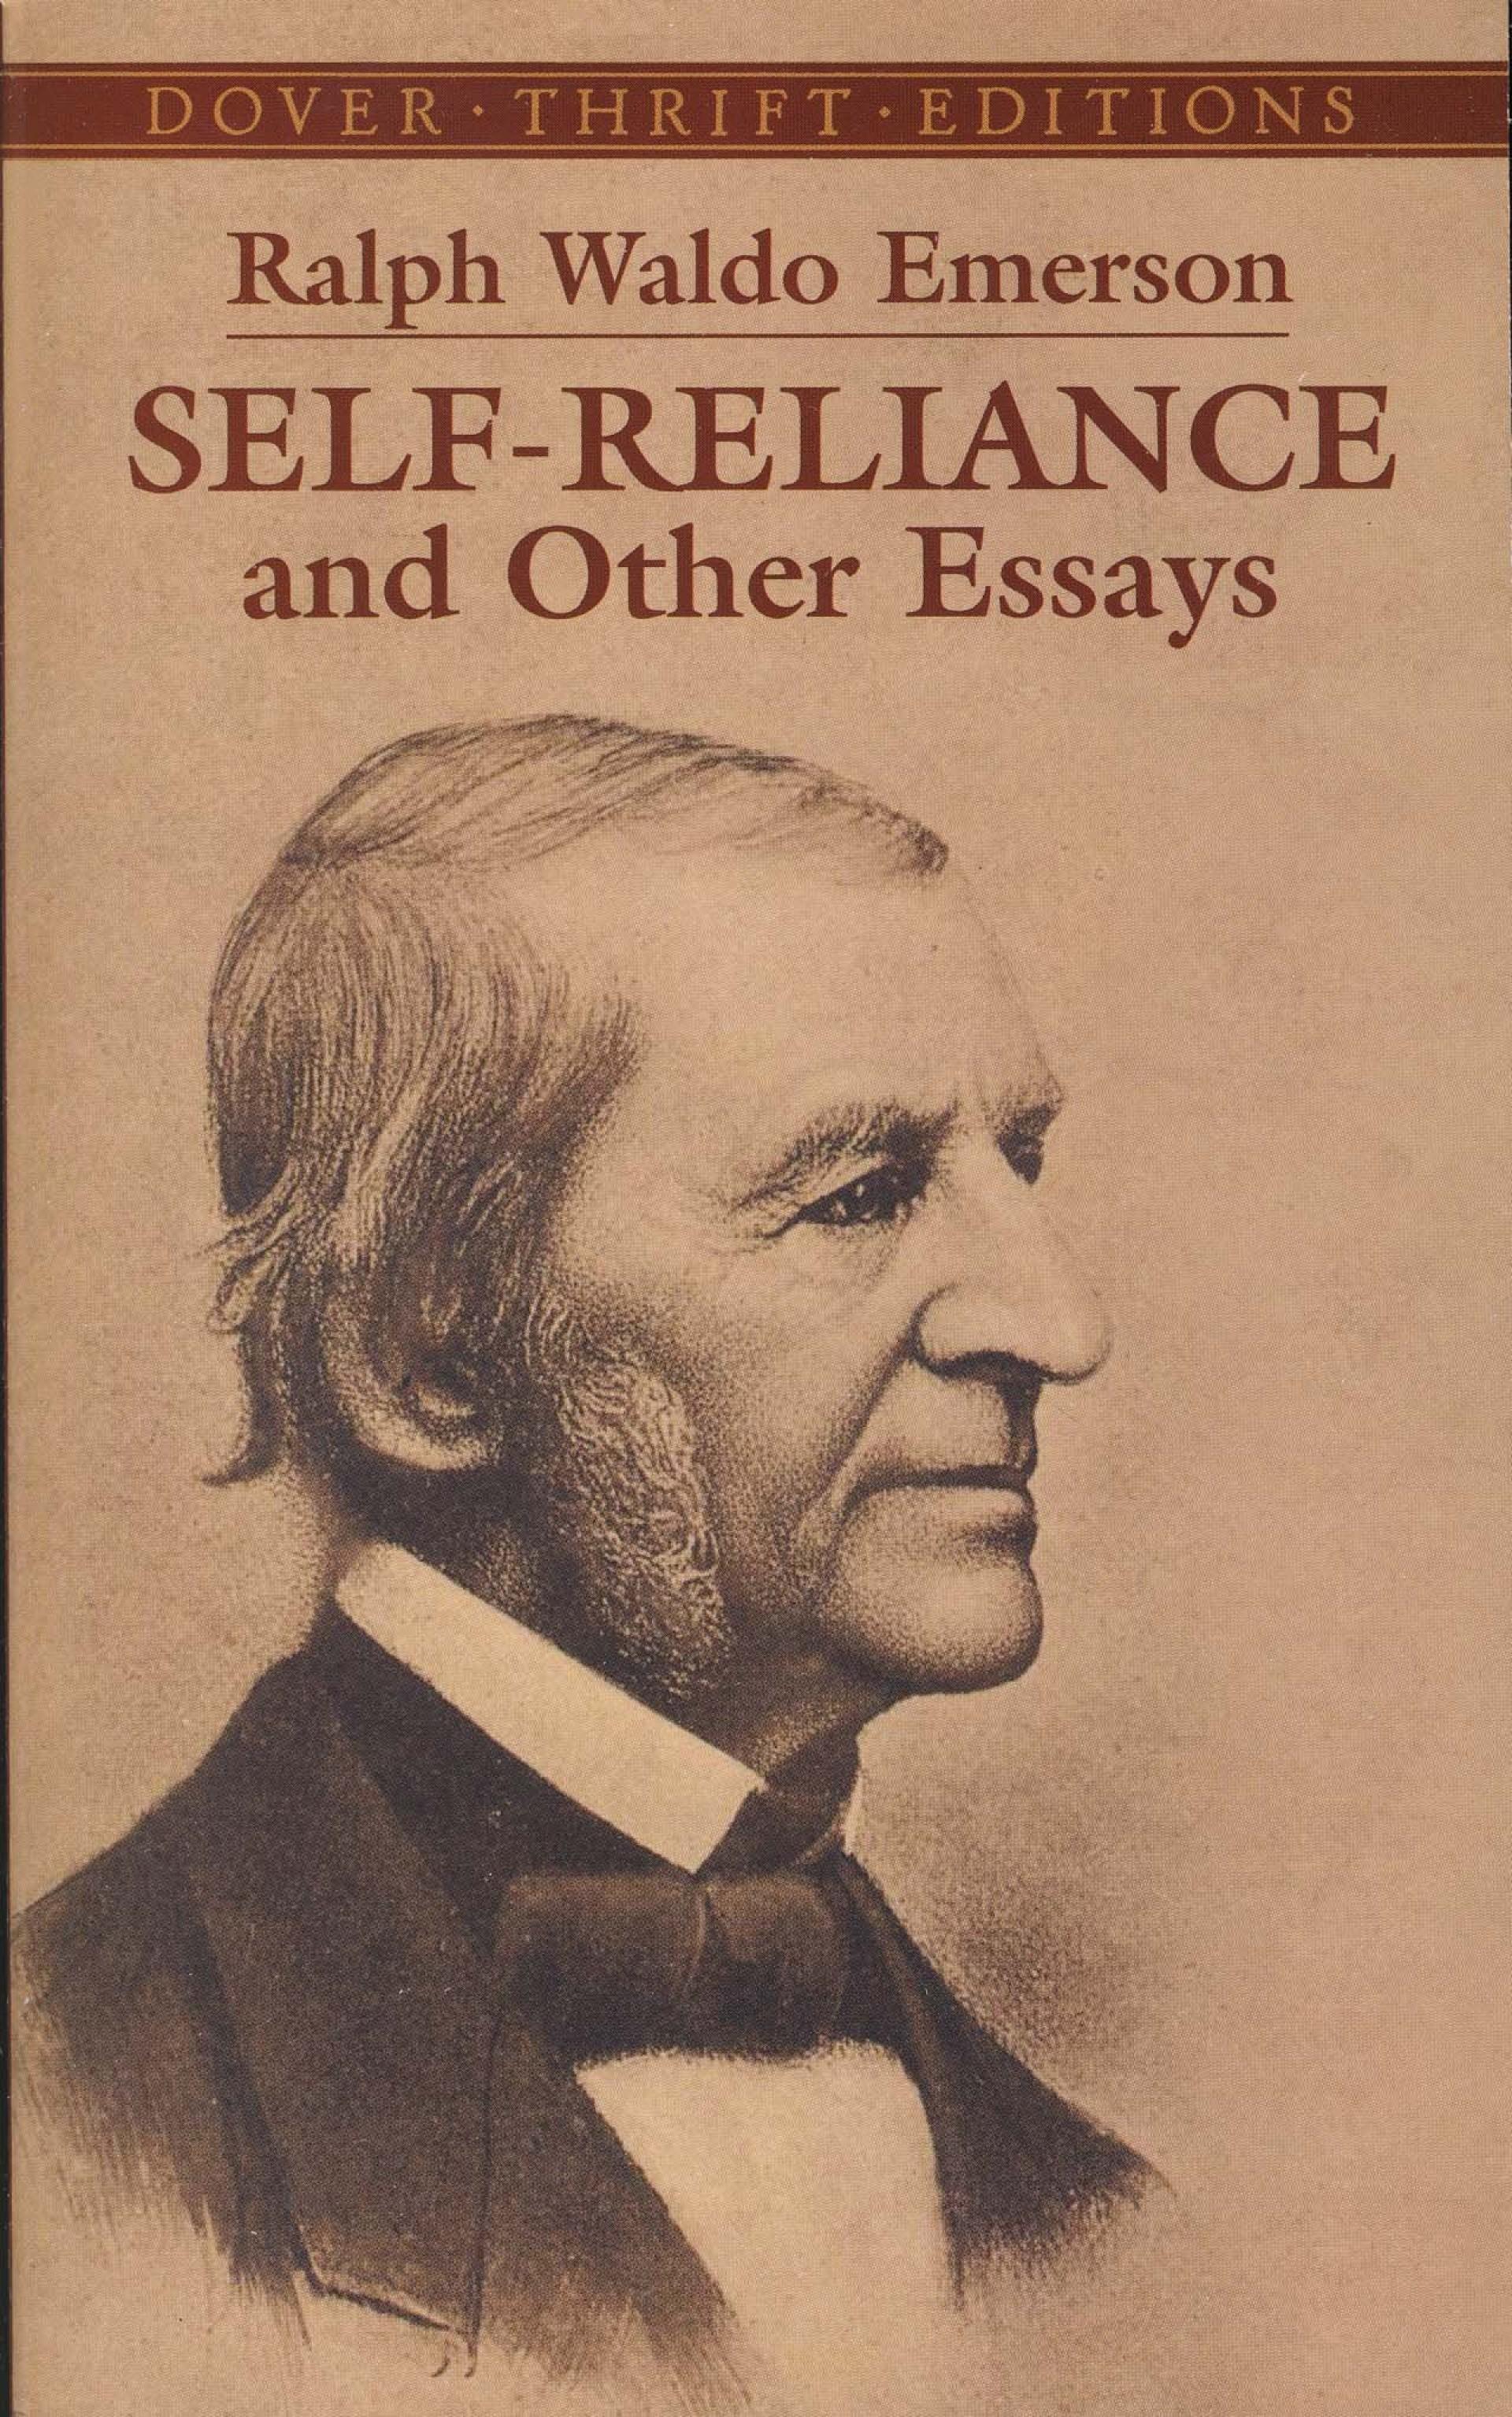 003 91btiwopxal Essay Example Emerson Dreaded Essays Ralph Pdf First Series Summary Waldo Nature 1920